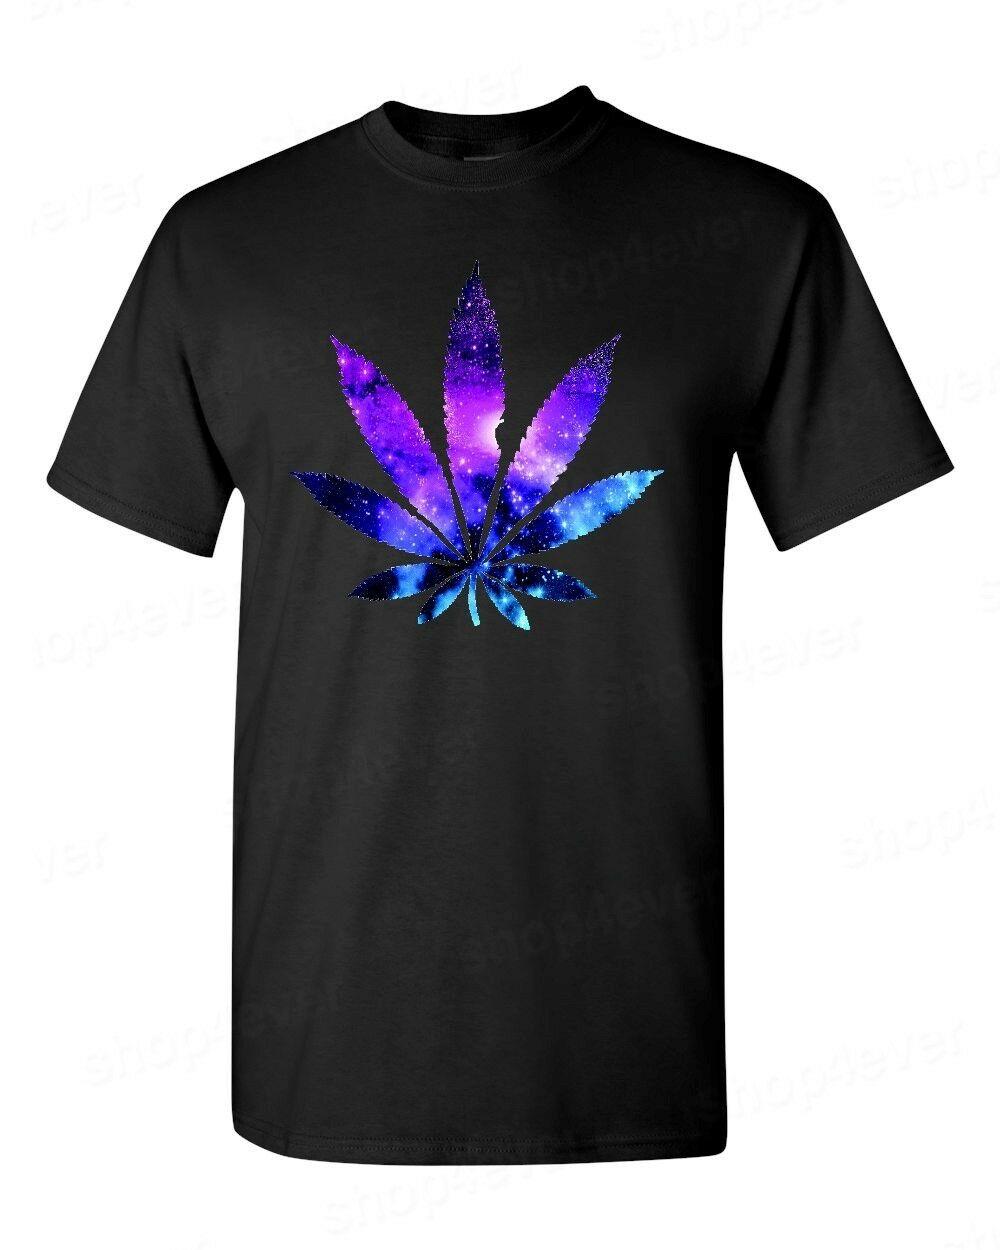 Galaxy Weed Leaf T-Shirt Marijuana Cannabis Stoner Kush Pot 420 Tees 1